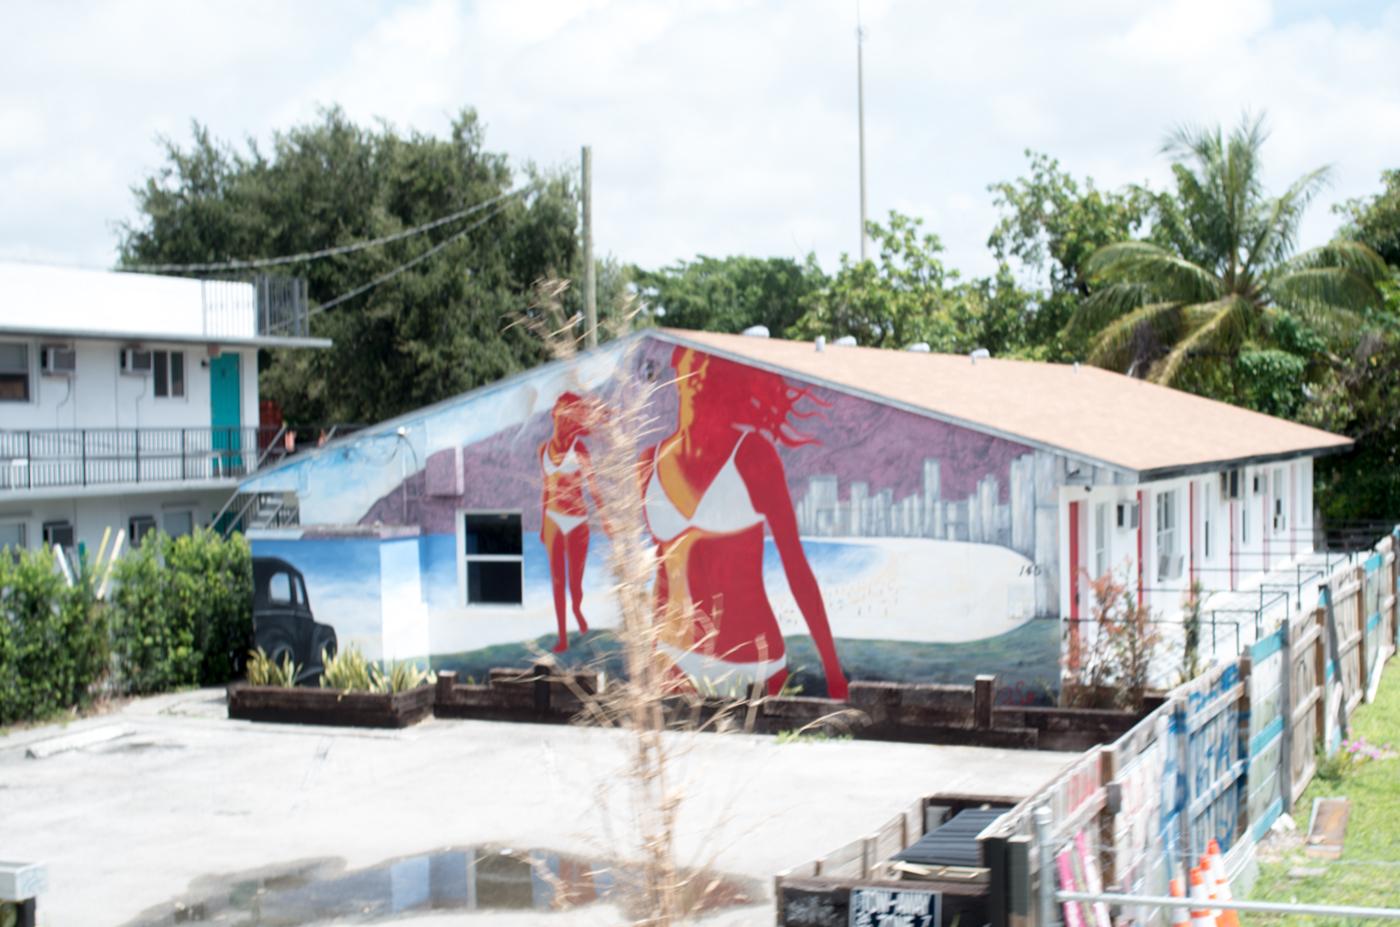 Street Art is everywhere.